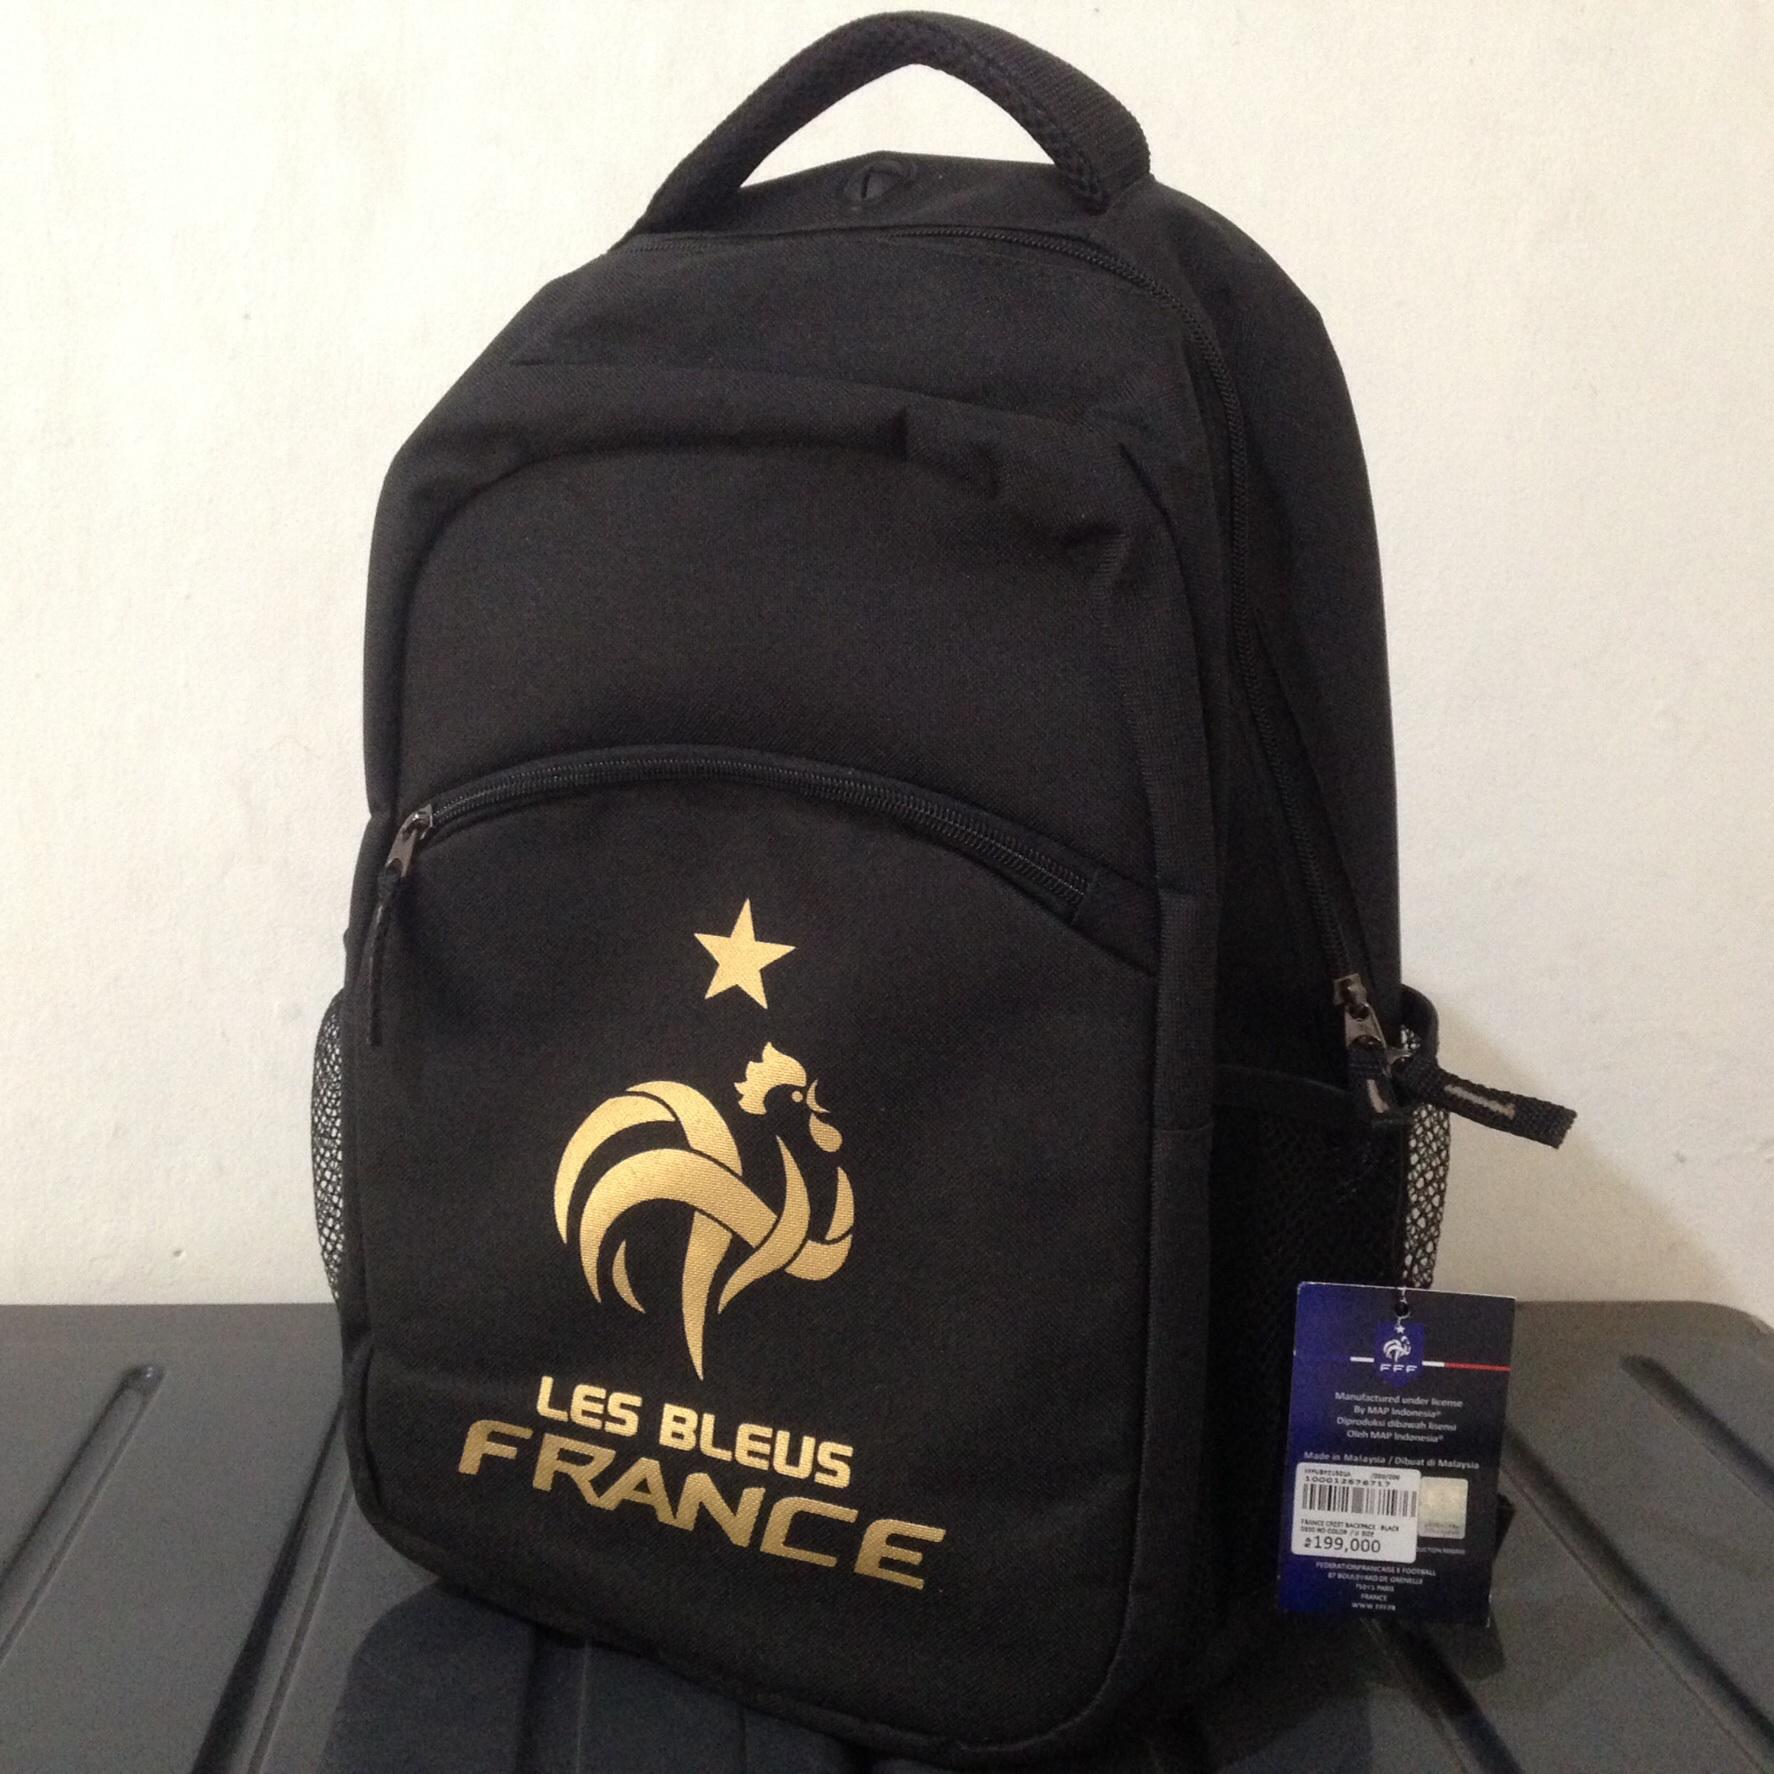 Diadora Shoebag Biru Info Harga Terkini dan Terlengkap Source · Tas Olahraga Adidas Versatile Diadora Shoebag Backpack Travelbag ORIGINAL